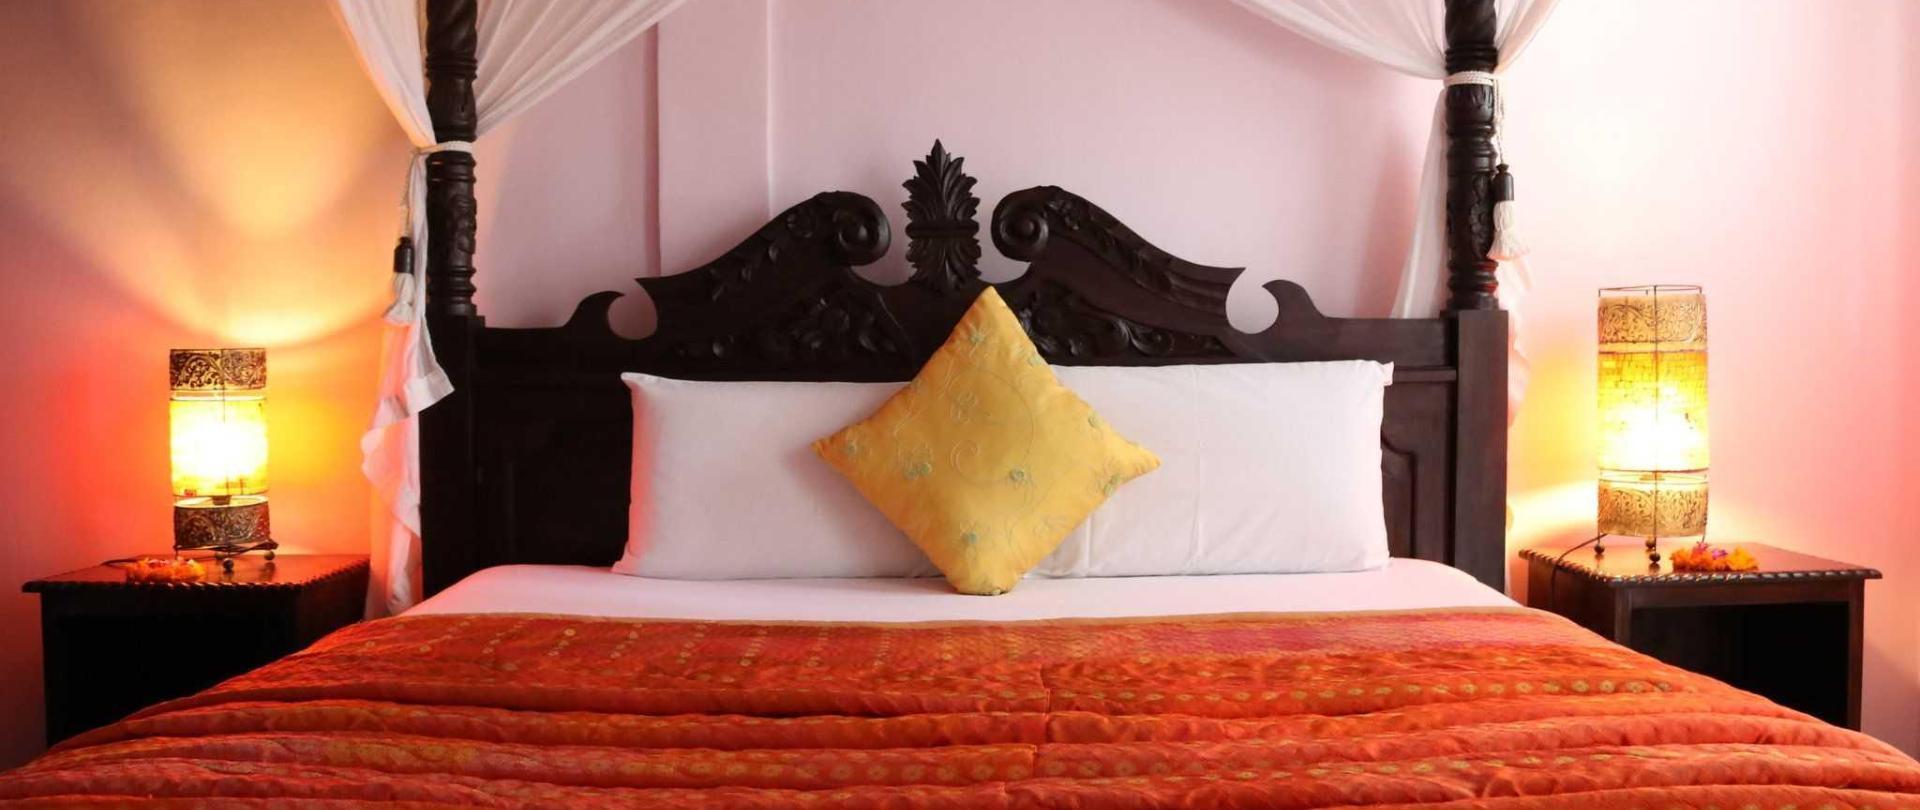 Room/Bed.JPG